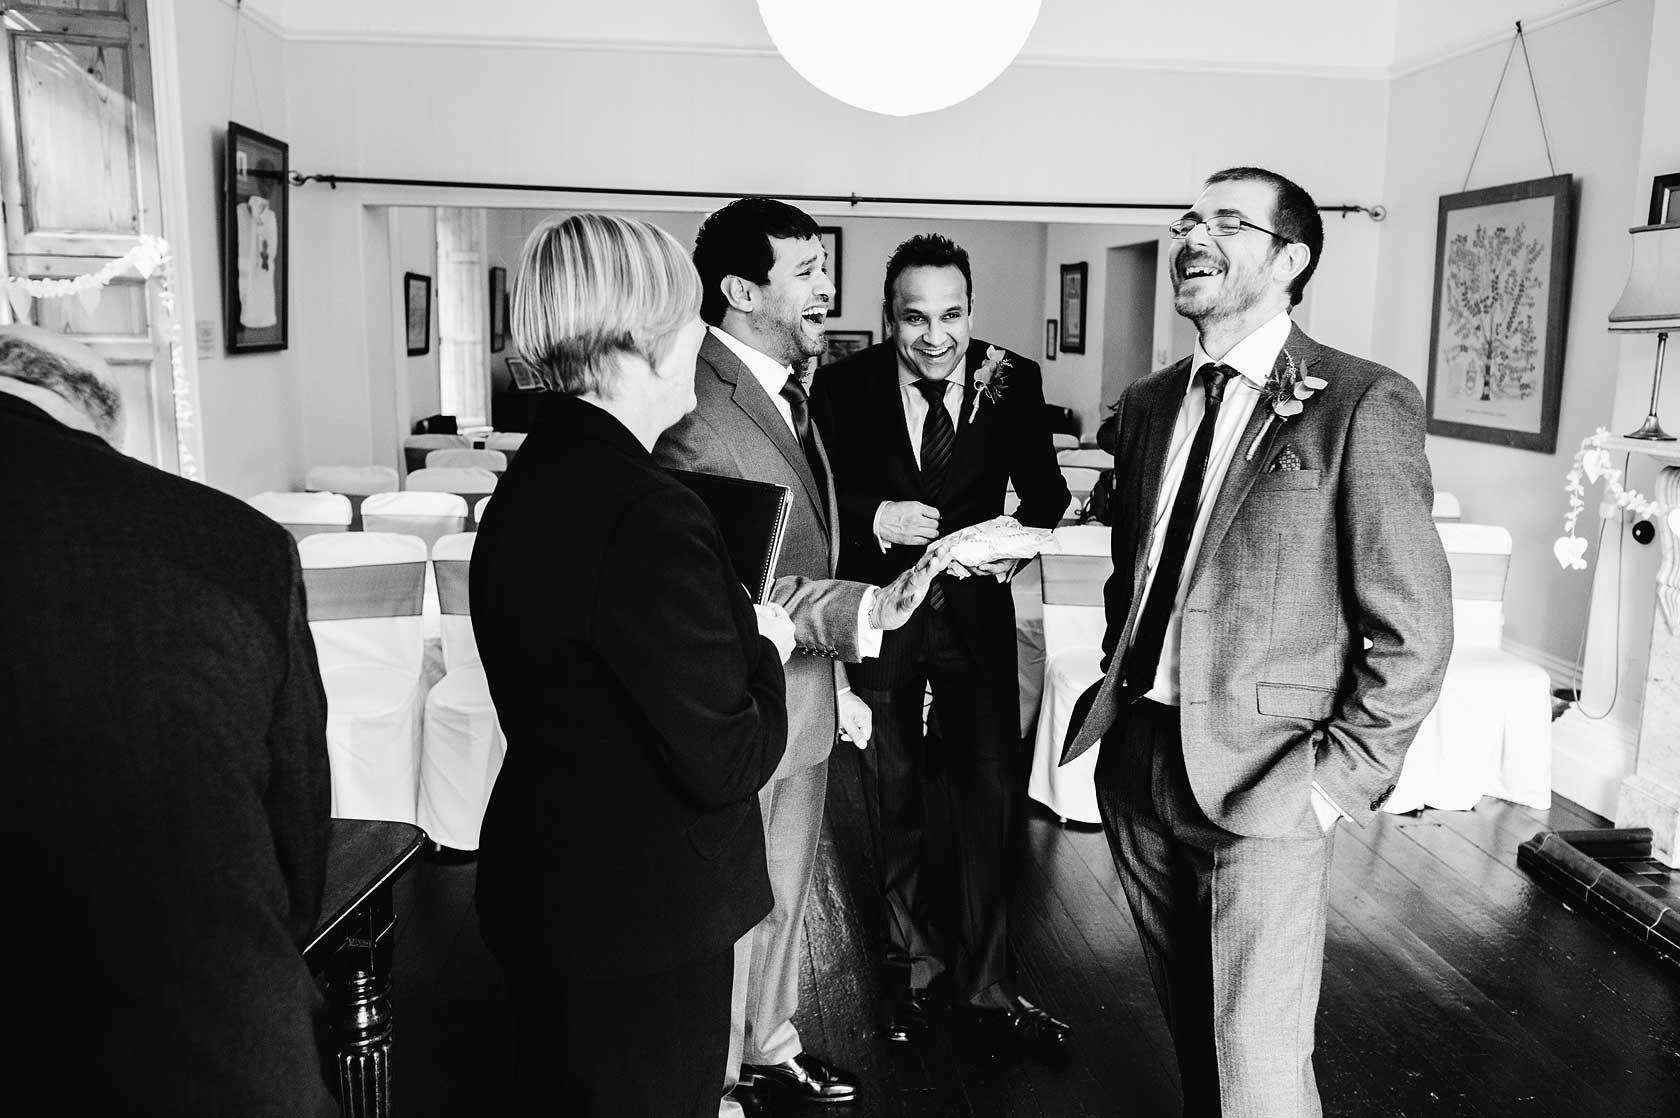 Reportage Wedding Photography in Wellington